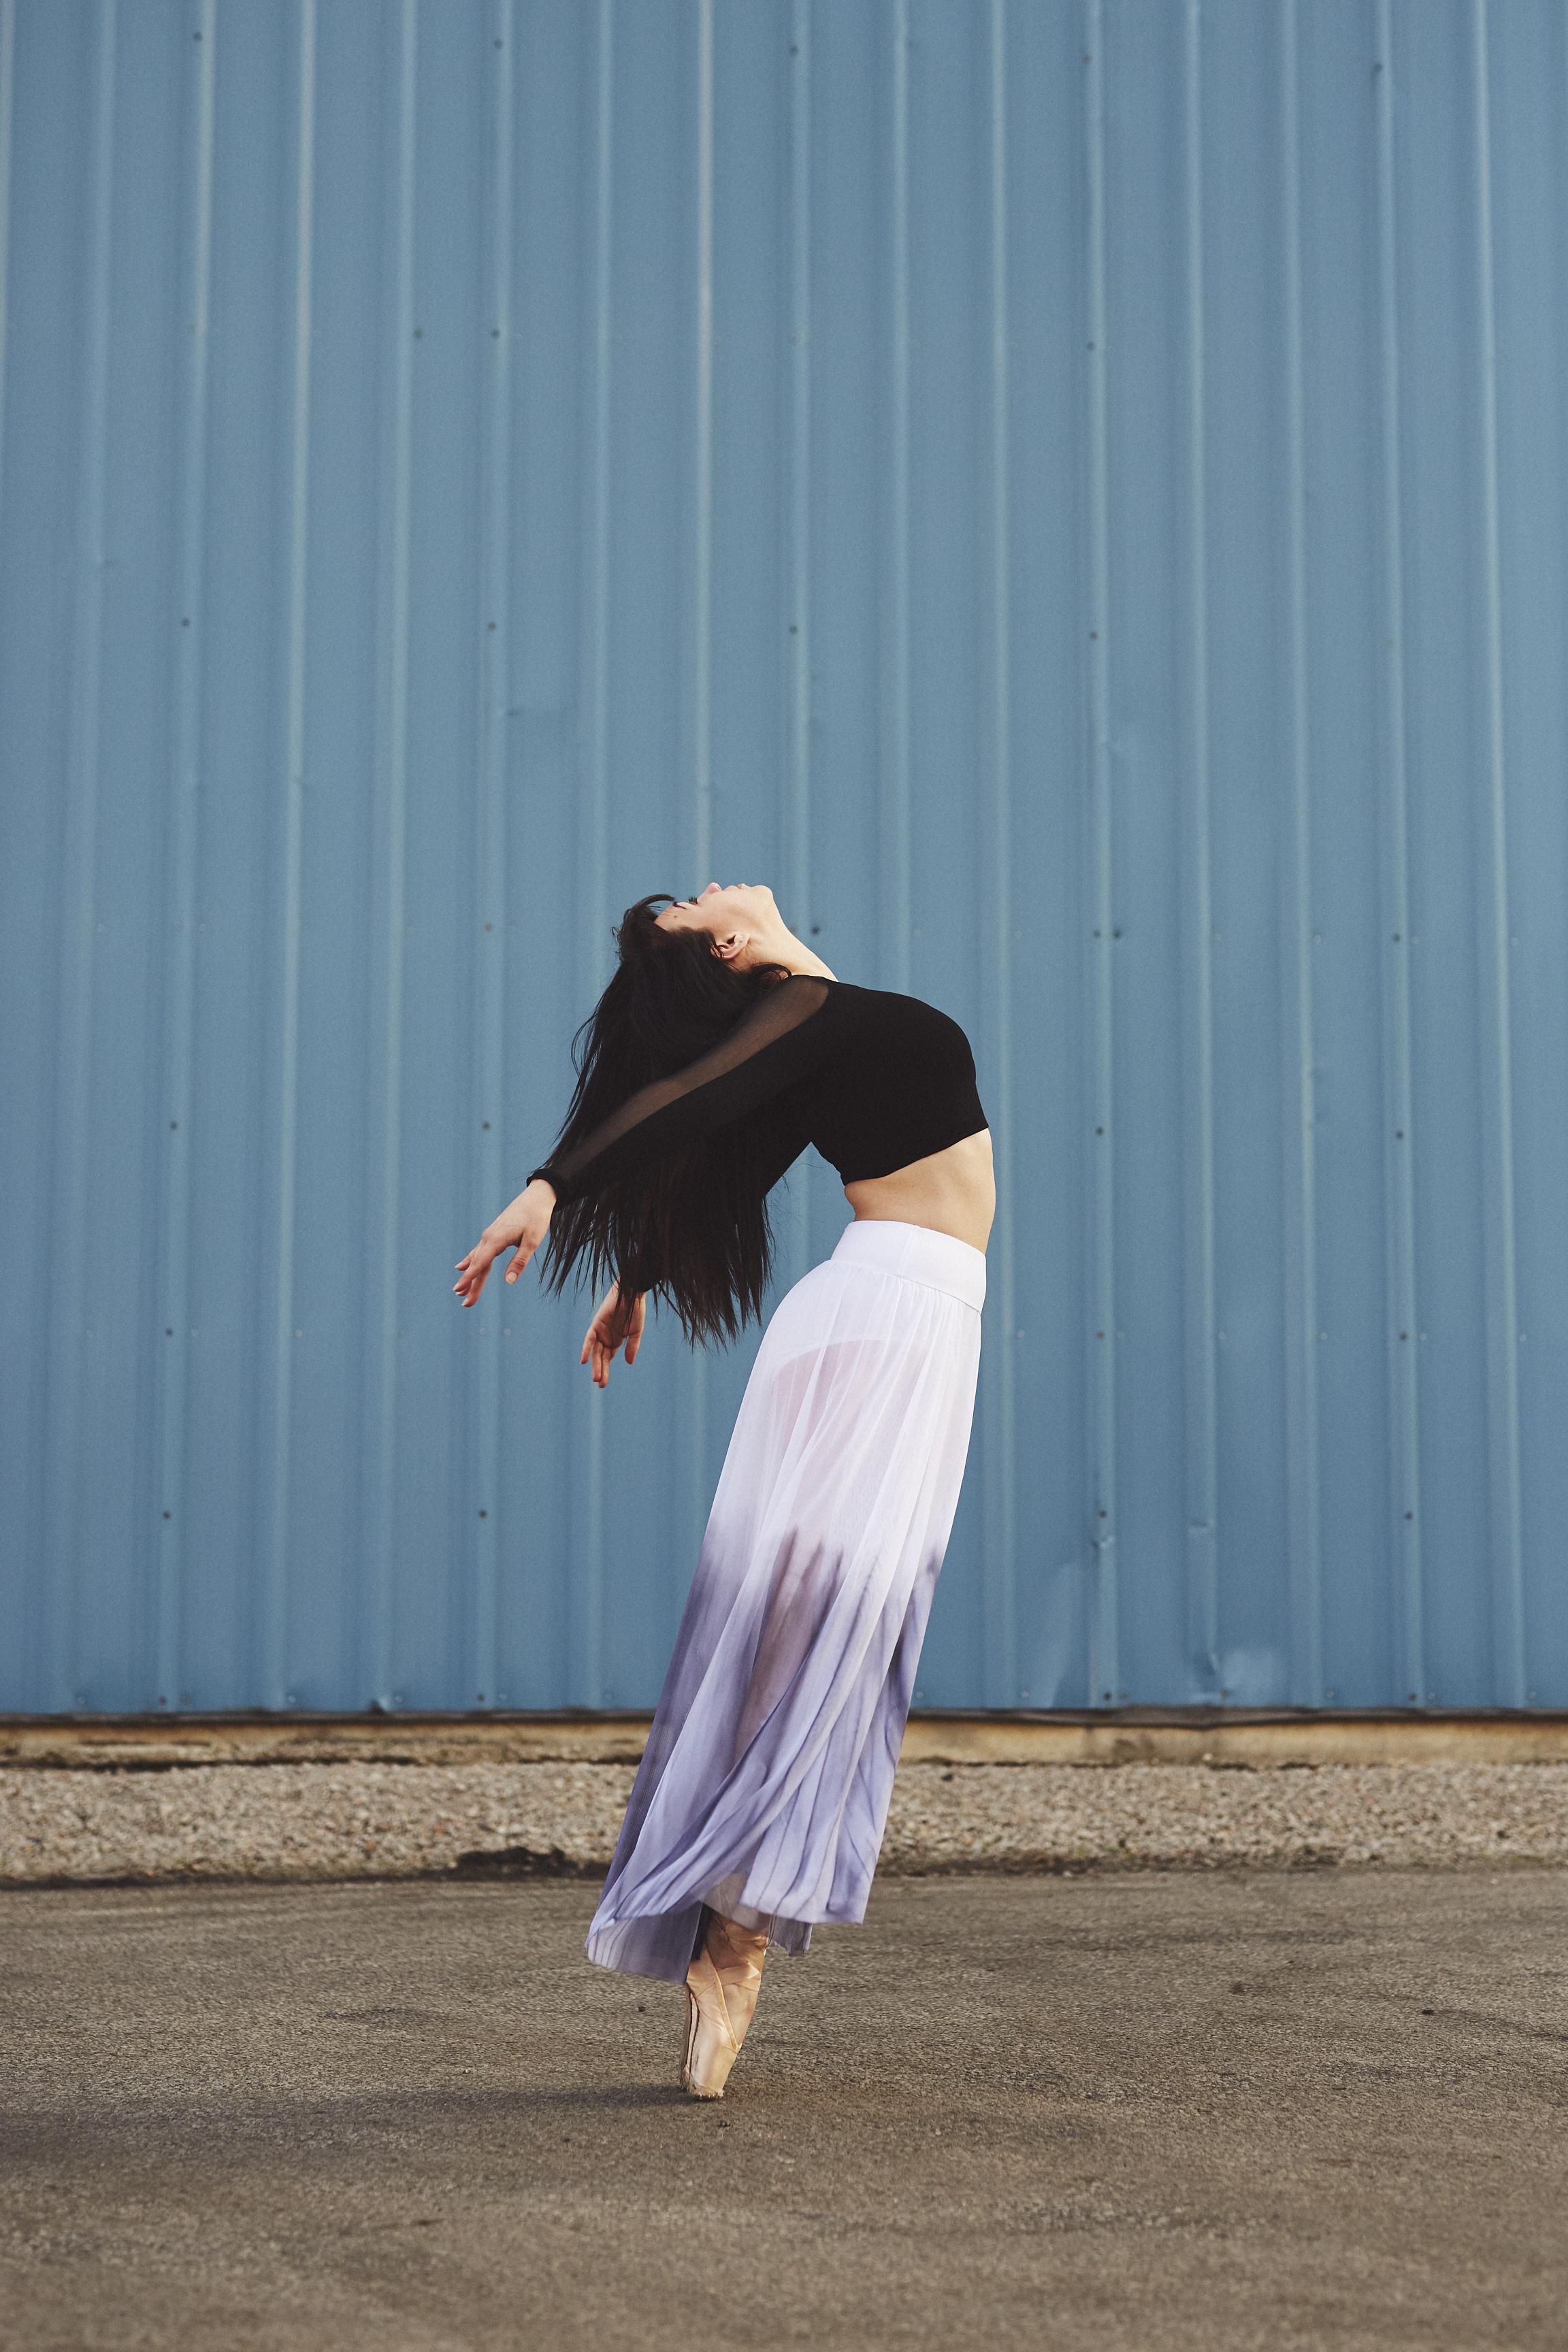 Brunette Ballet Dancer